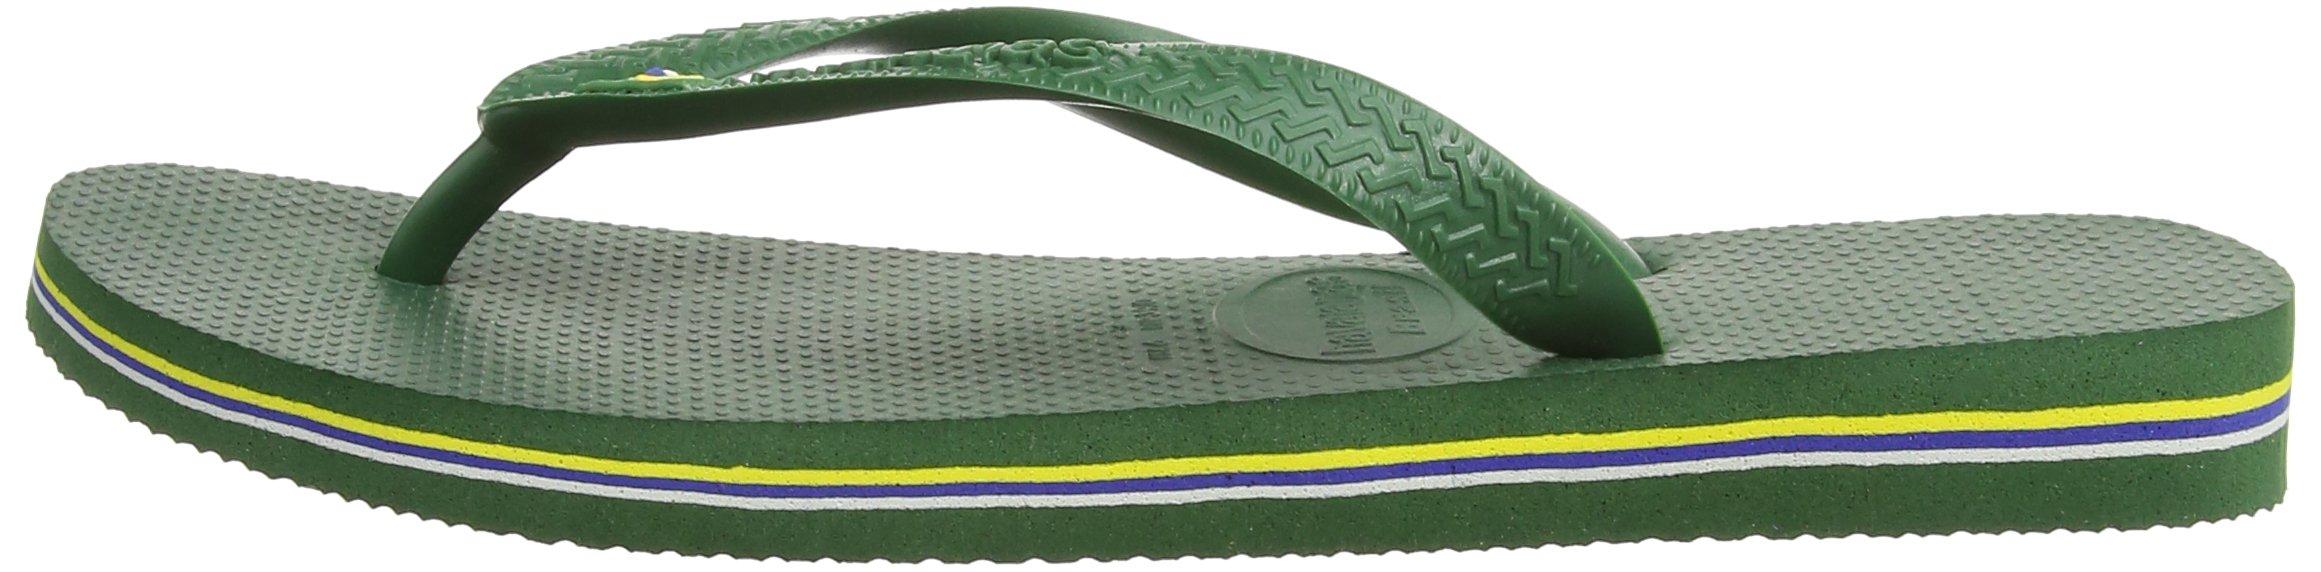 Havaianas Brasil, Unisex Adult's Flip Flops, Green (Brasil Amazonia), 3/4 UK (37/38EU) (35/36 BR) by Havaianas (Image #6)